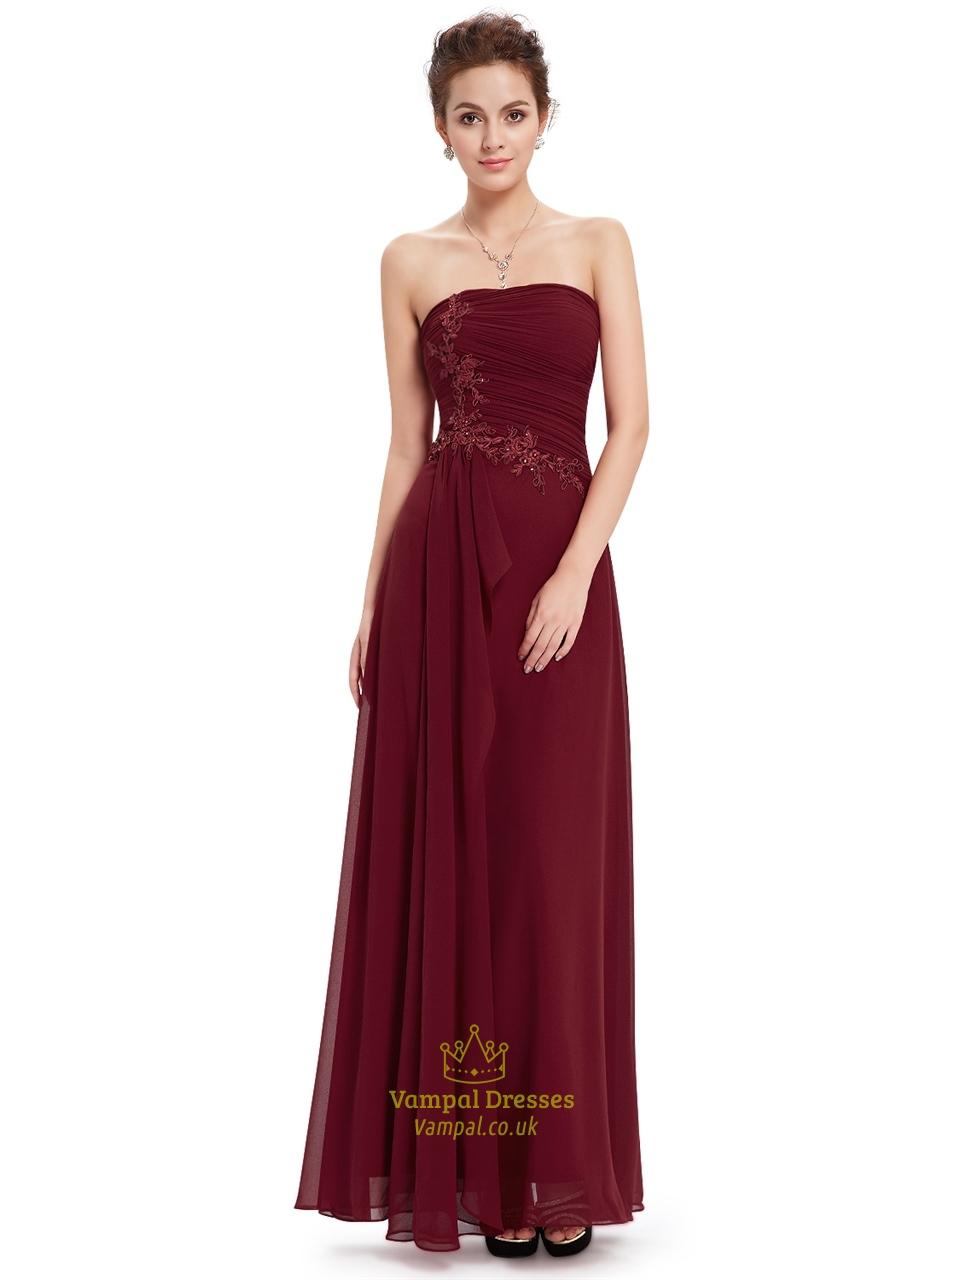 Burgundy Chiffon Strapless Bridesmaid Dresses With Applique Detail | Vampal Dresses